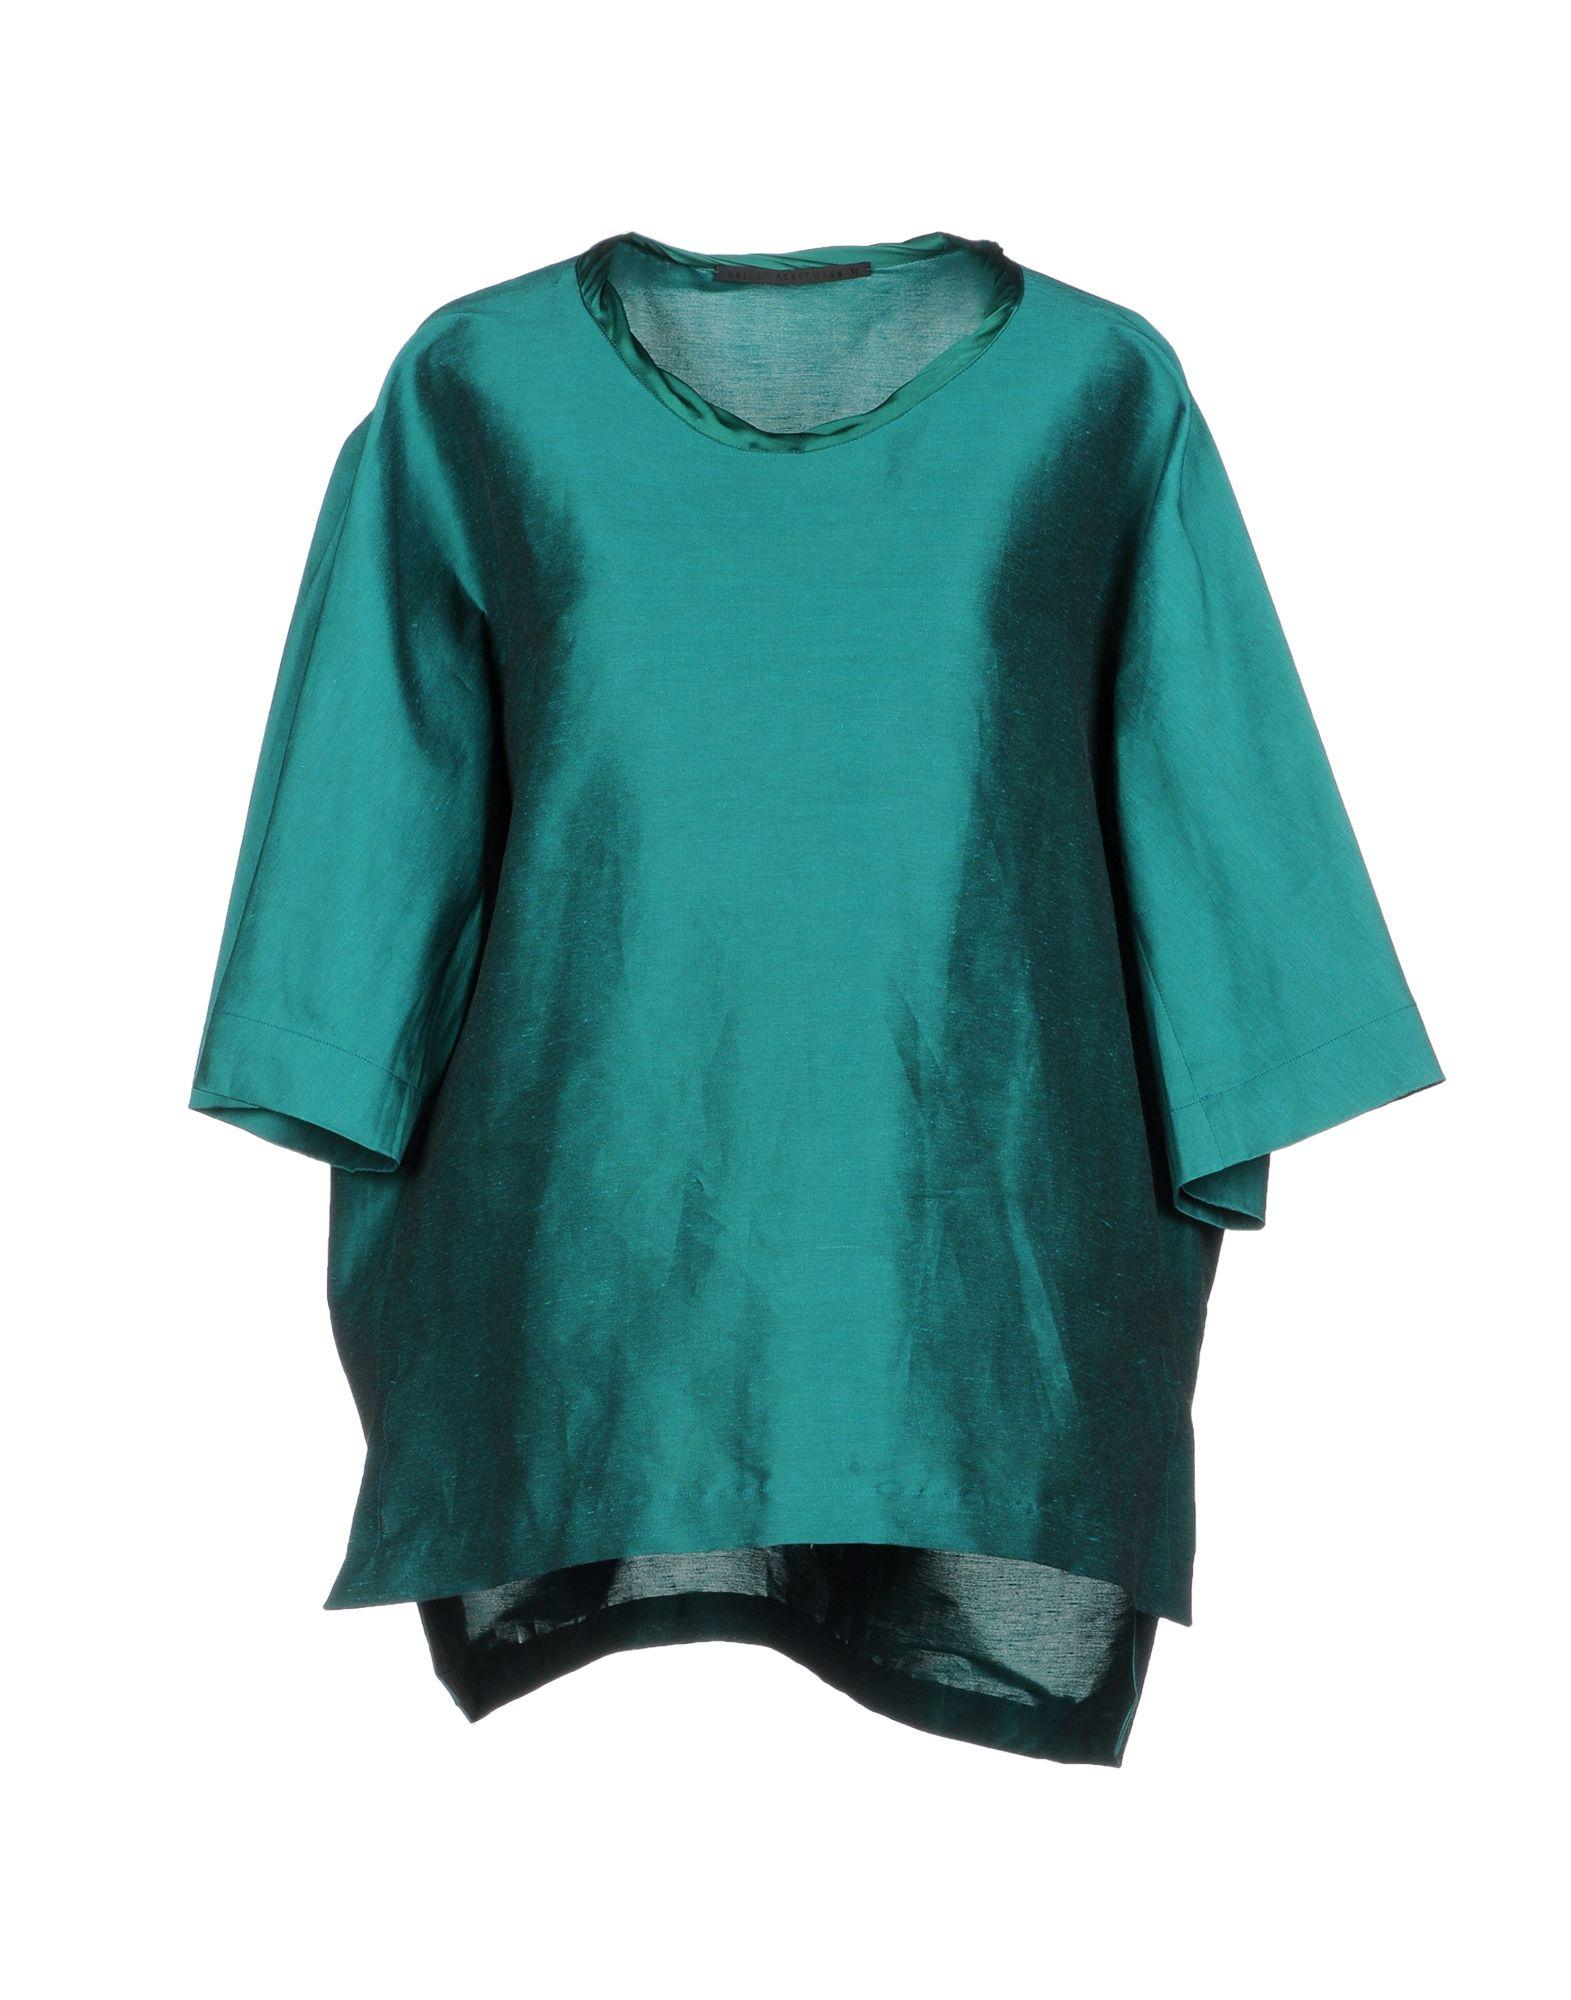 927700ae515025 Haider Ackermann Blouse In Emerald Green | ModeSens